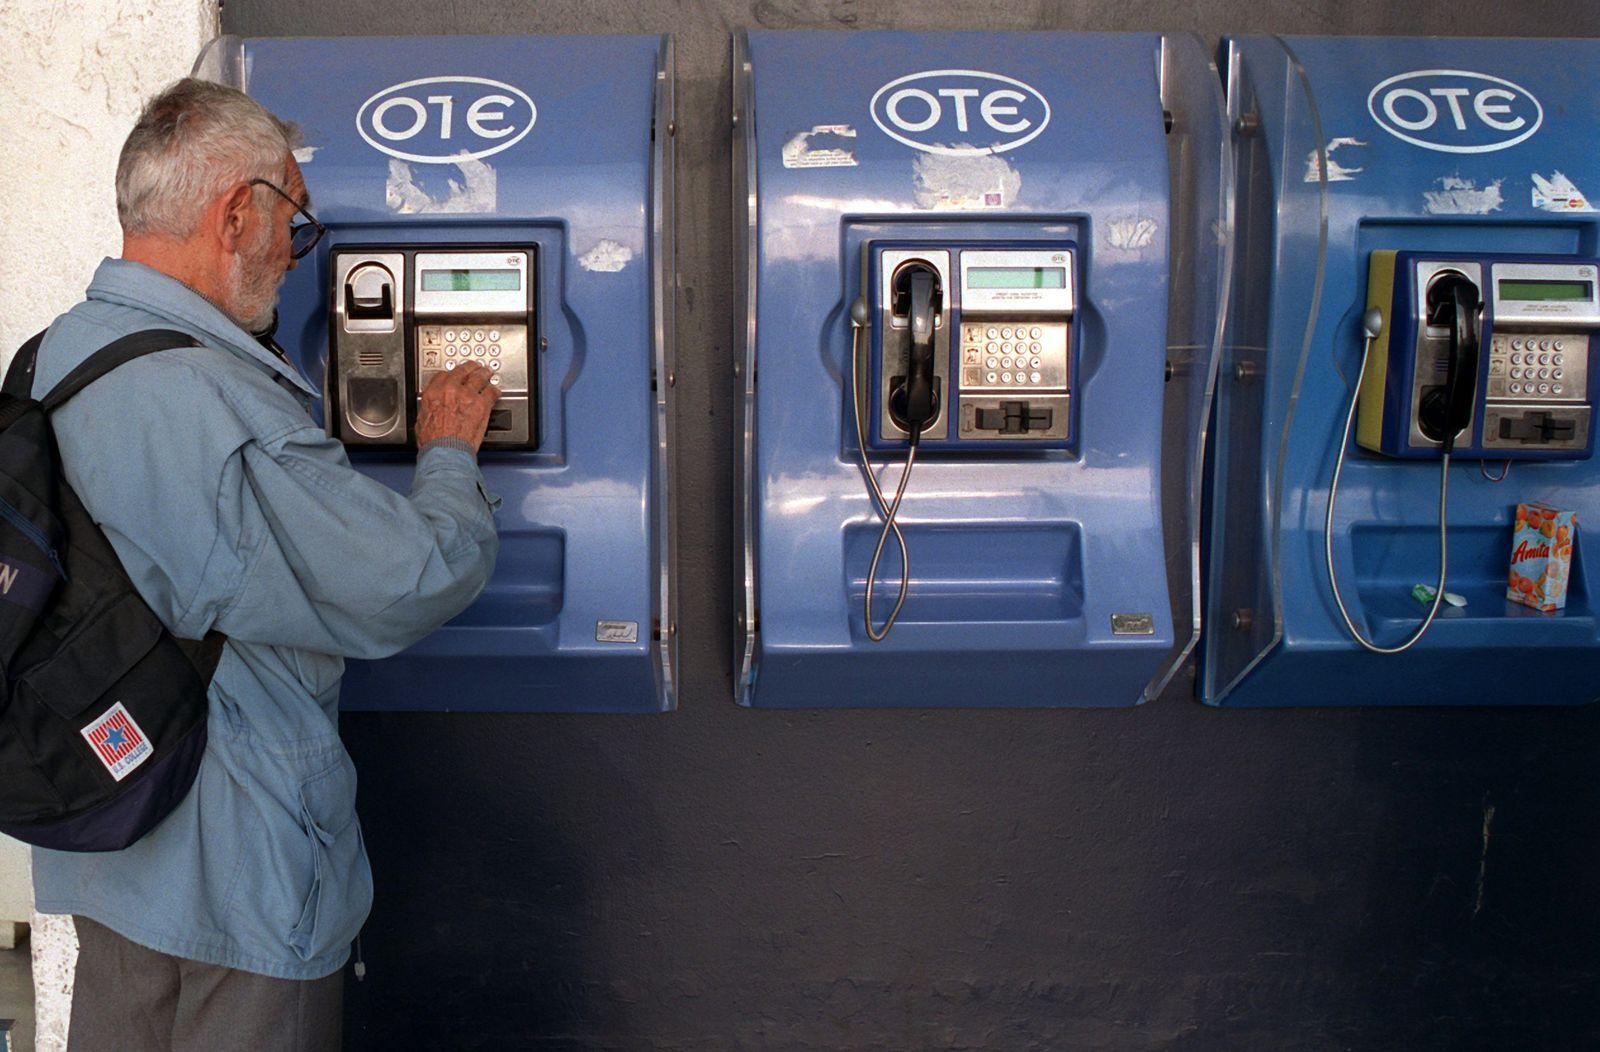 Griechenland / Hellenic Telecommunications Org. / OTE